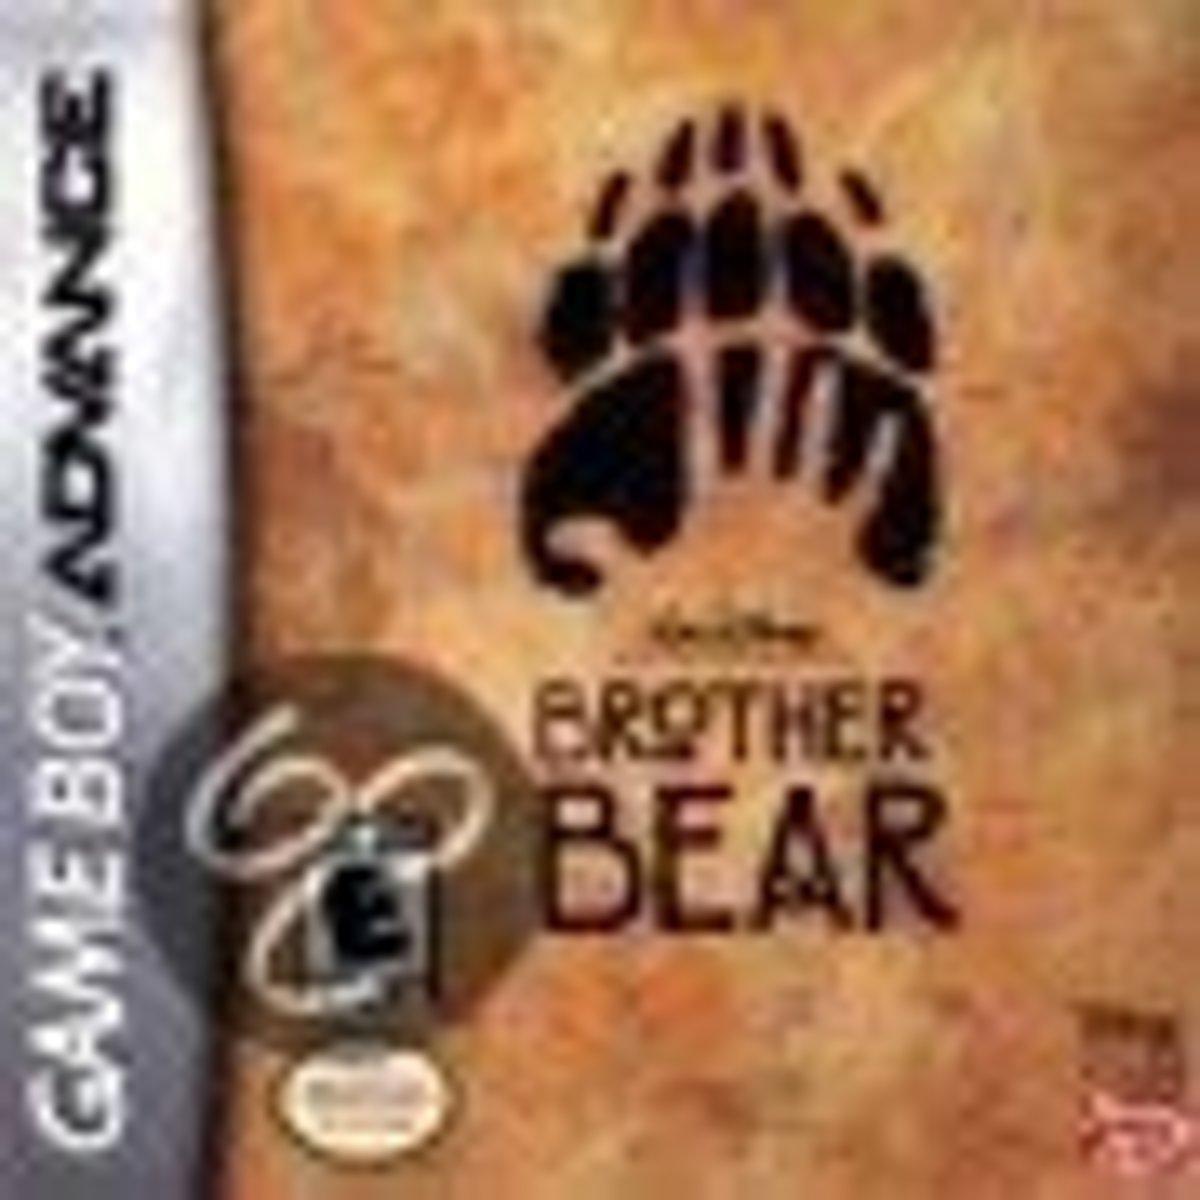 Brother Bear (disney) kopen